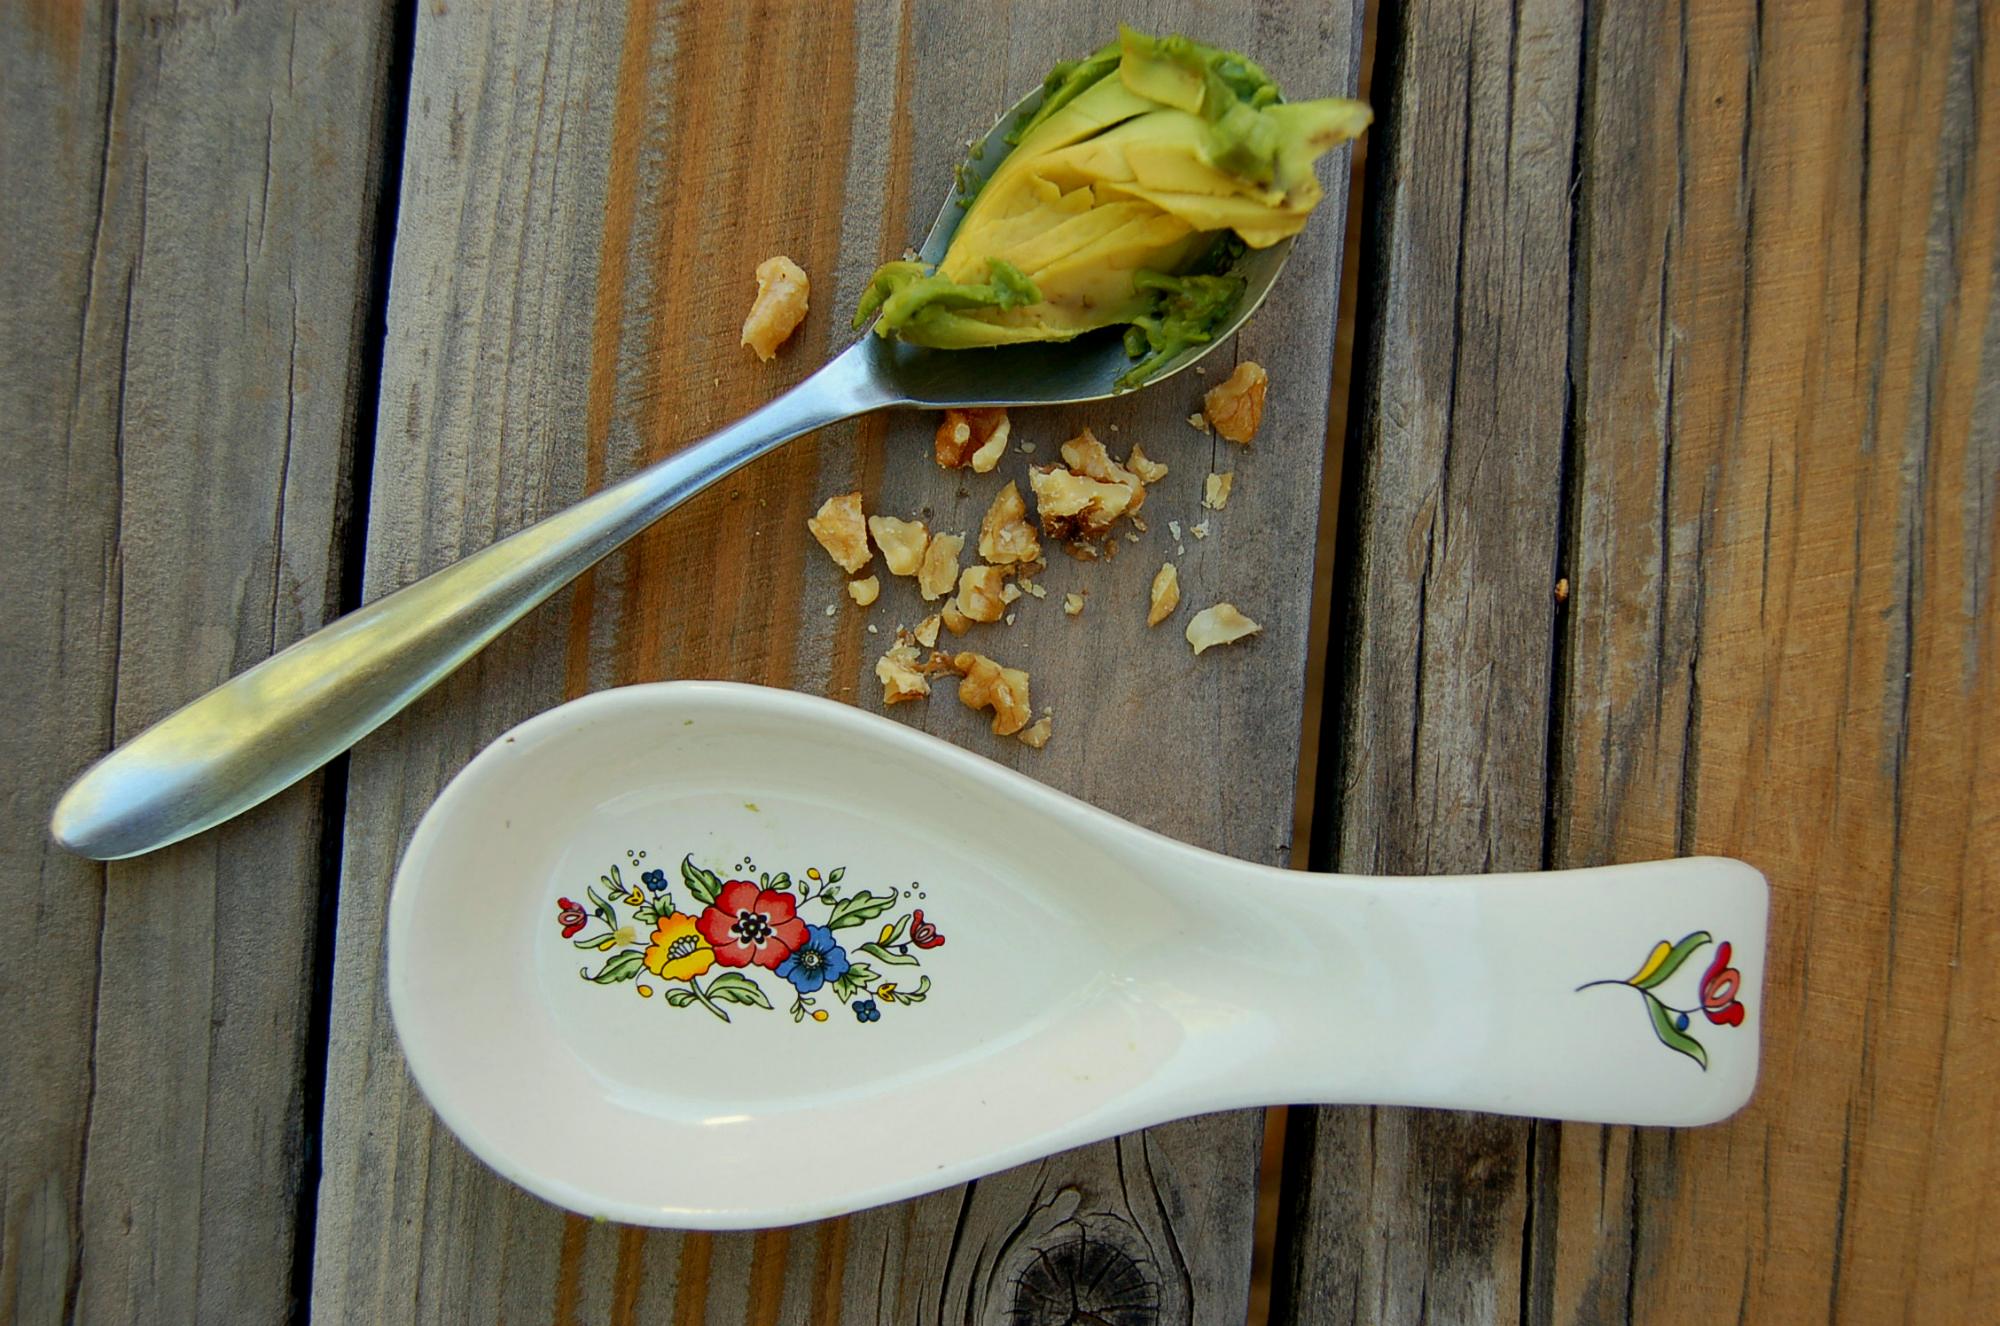 easy_quinoa_and_veggies_spoon_avo_walnuts